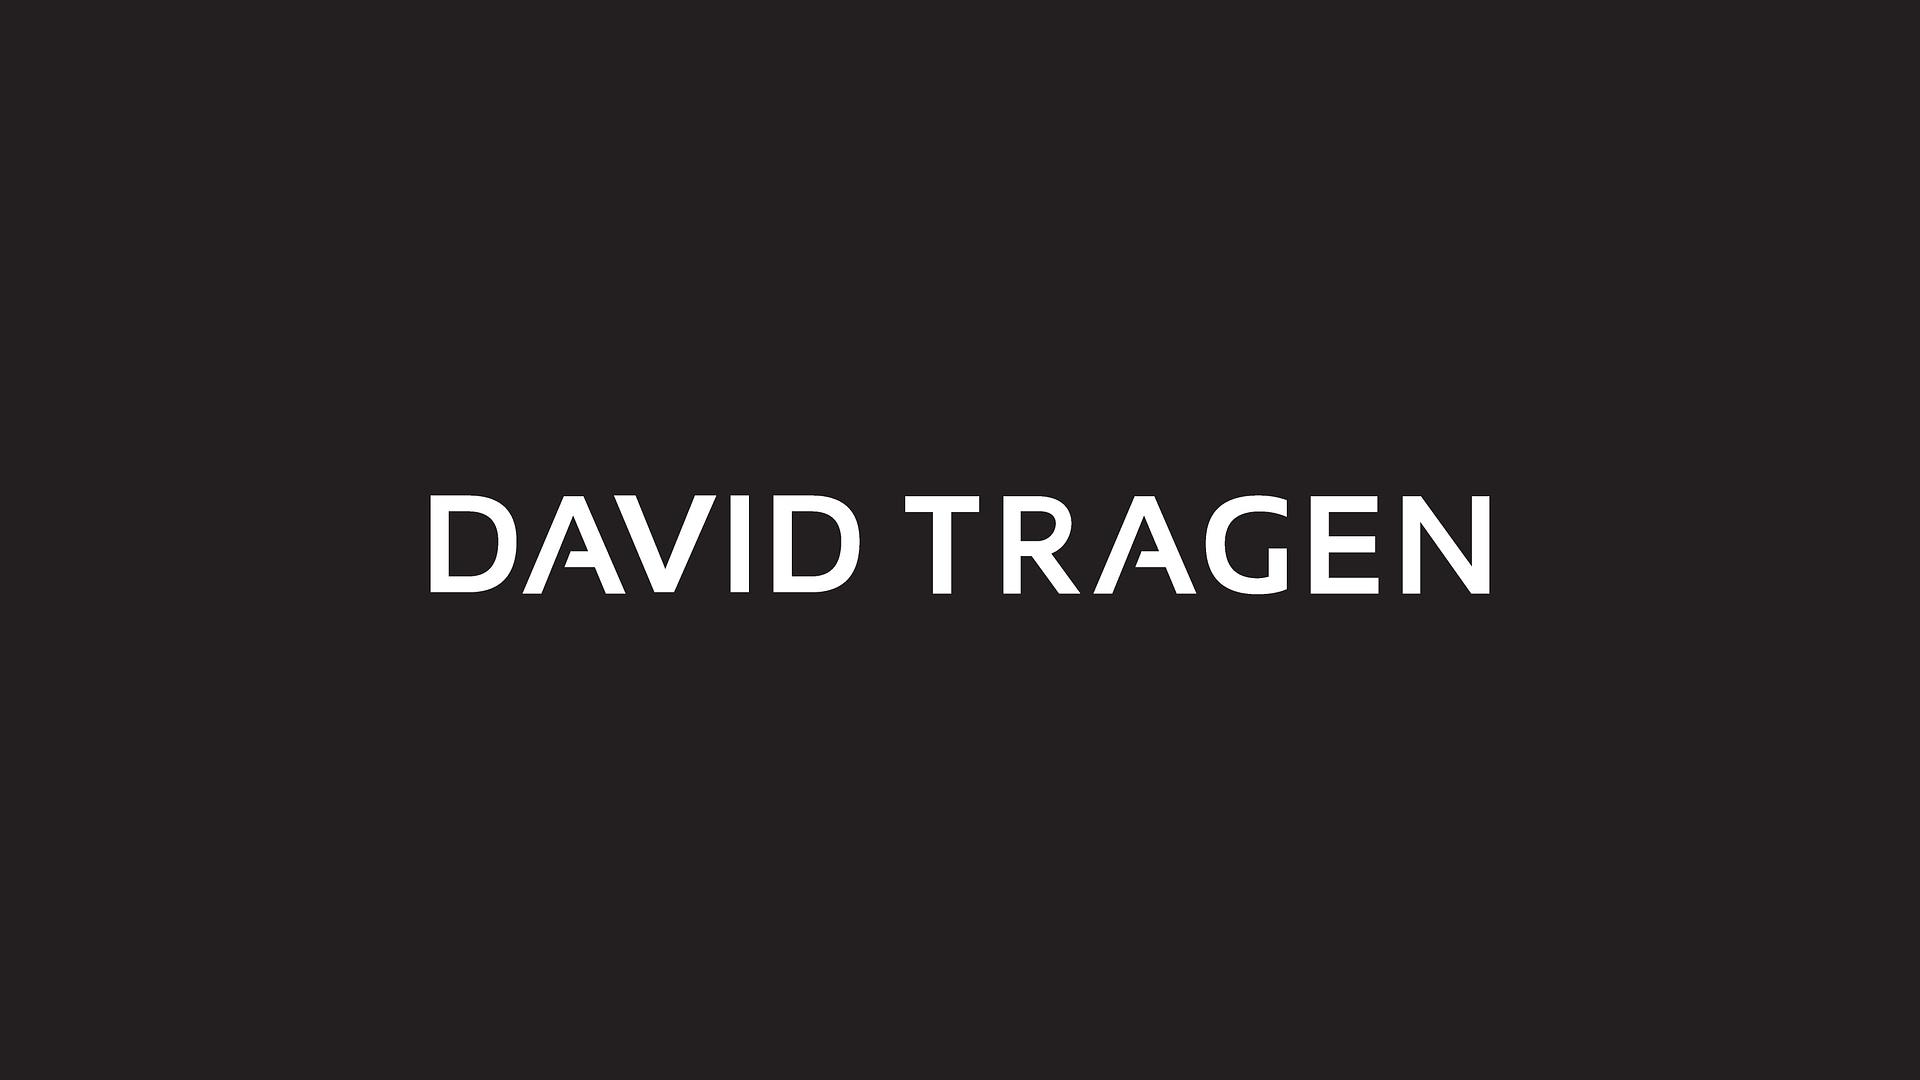 David Tragen logo